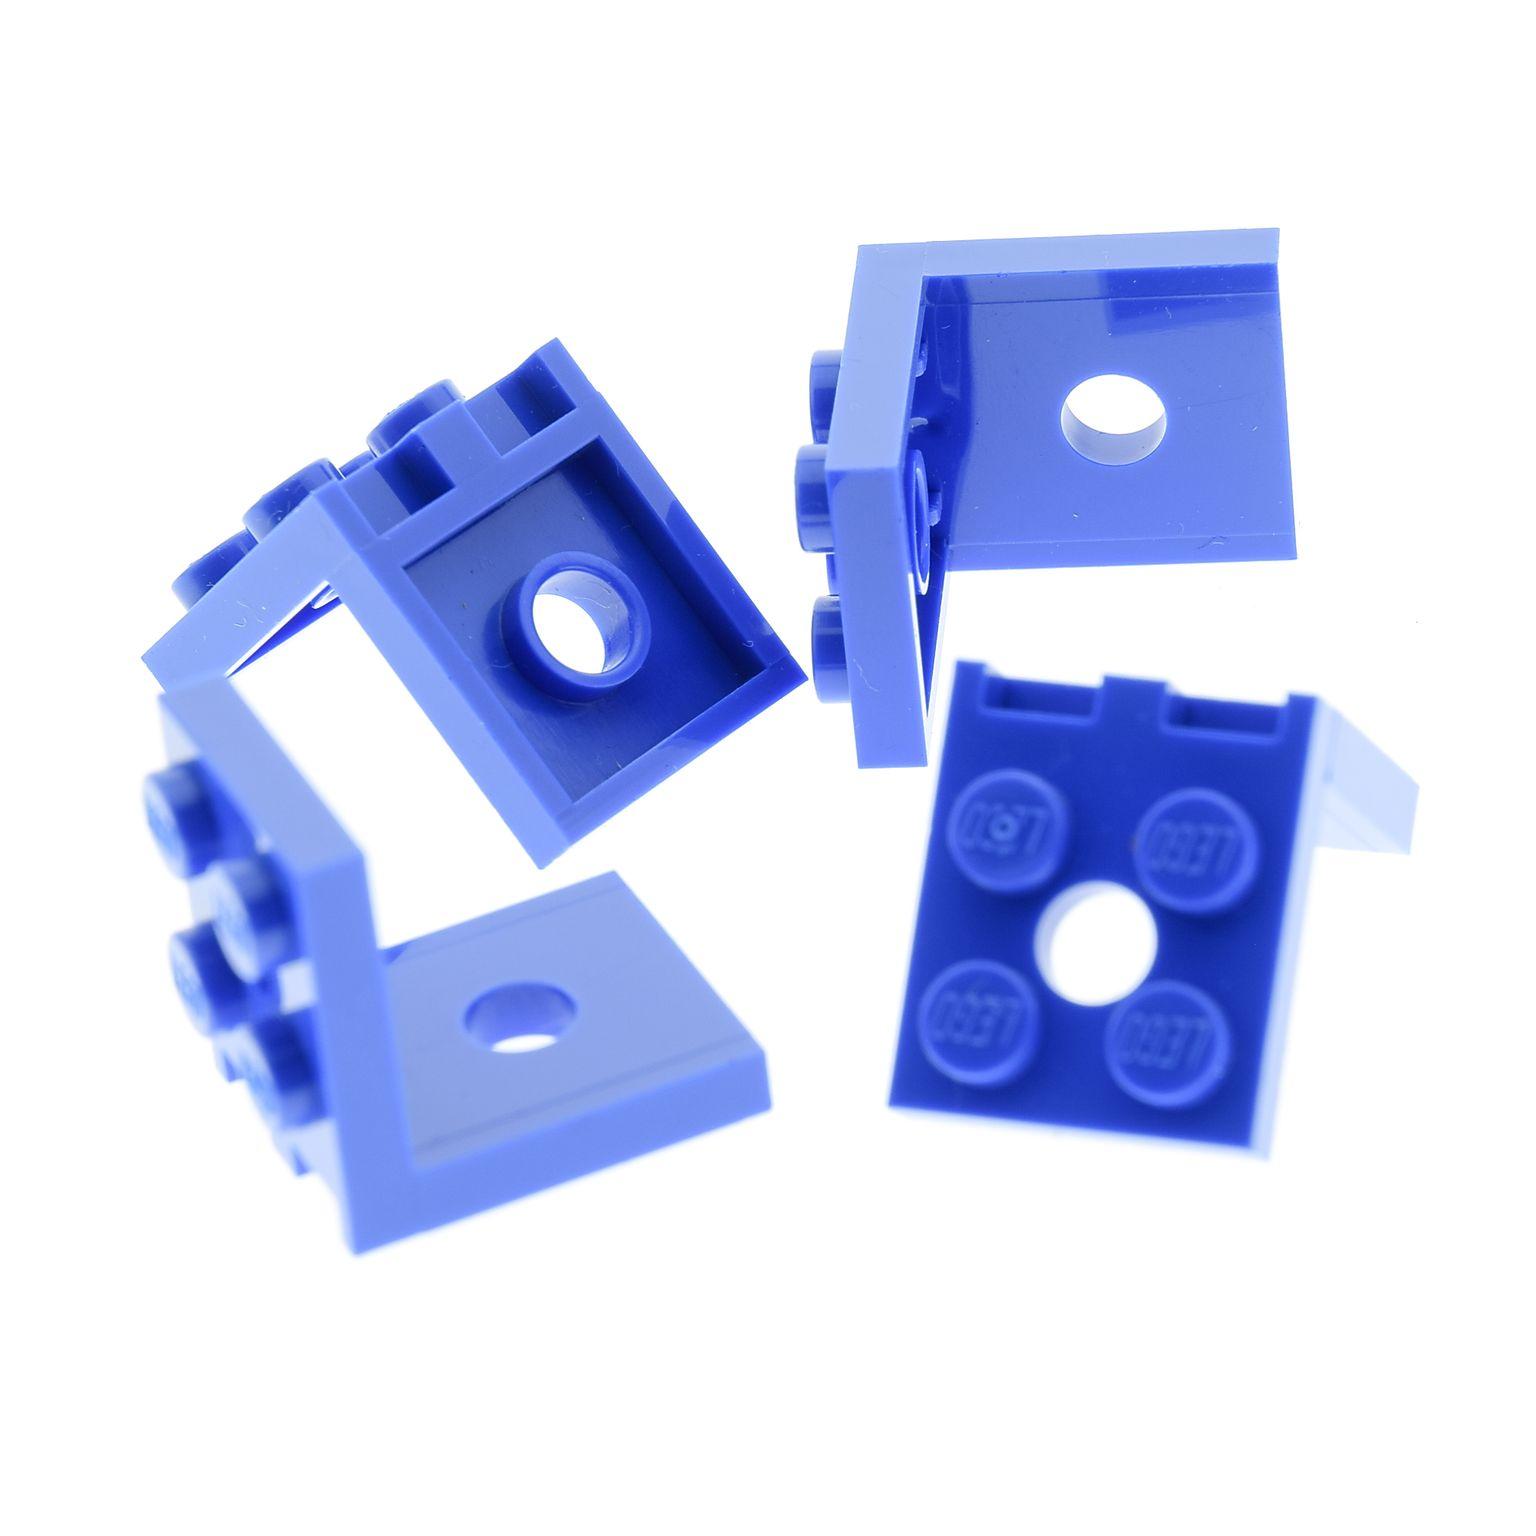 Lego 8 x Winkelplatte Winkel Halter 2x2-2x2 weiß 3956 Classic Space